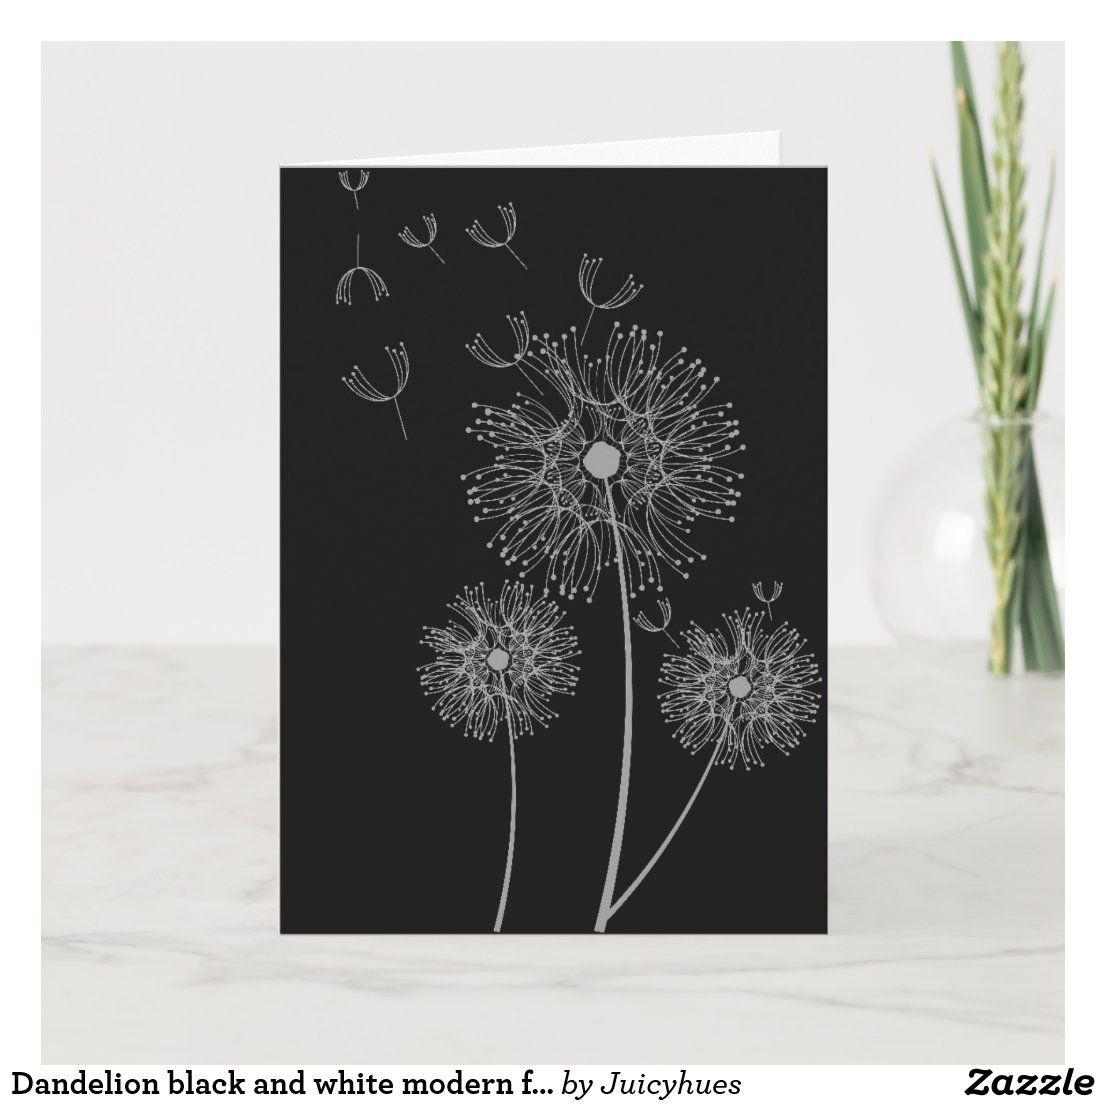 Dandelion Black And White Modern Floral Birthday Card Zazzle Com Birthday Cards Dandelion Art Modern Floral